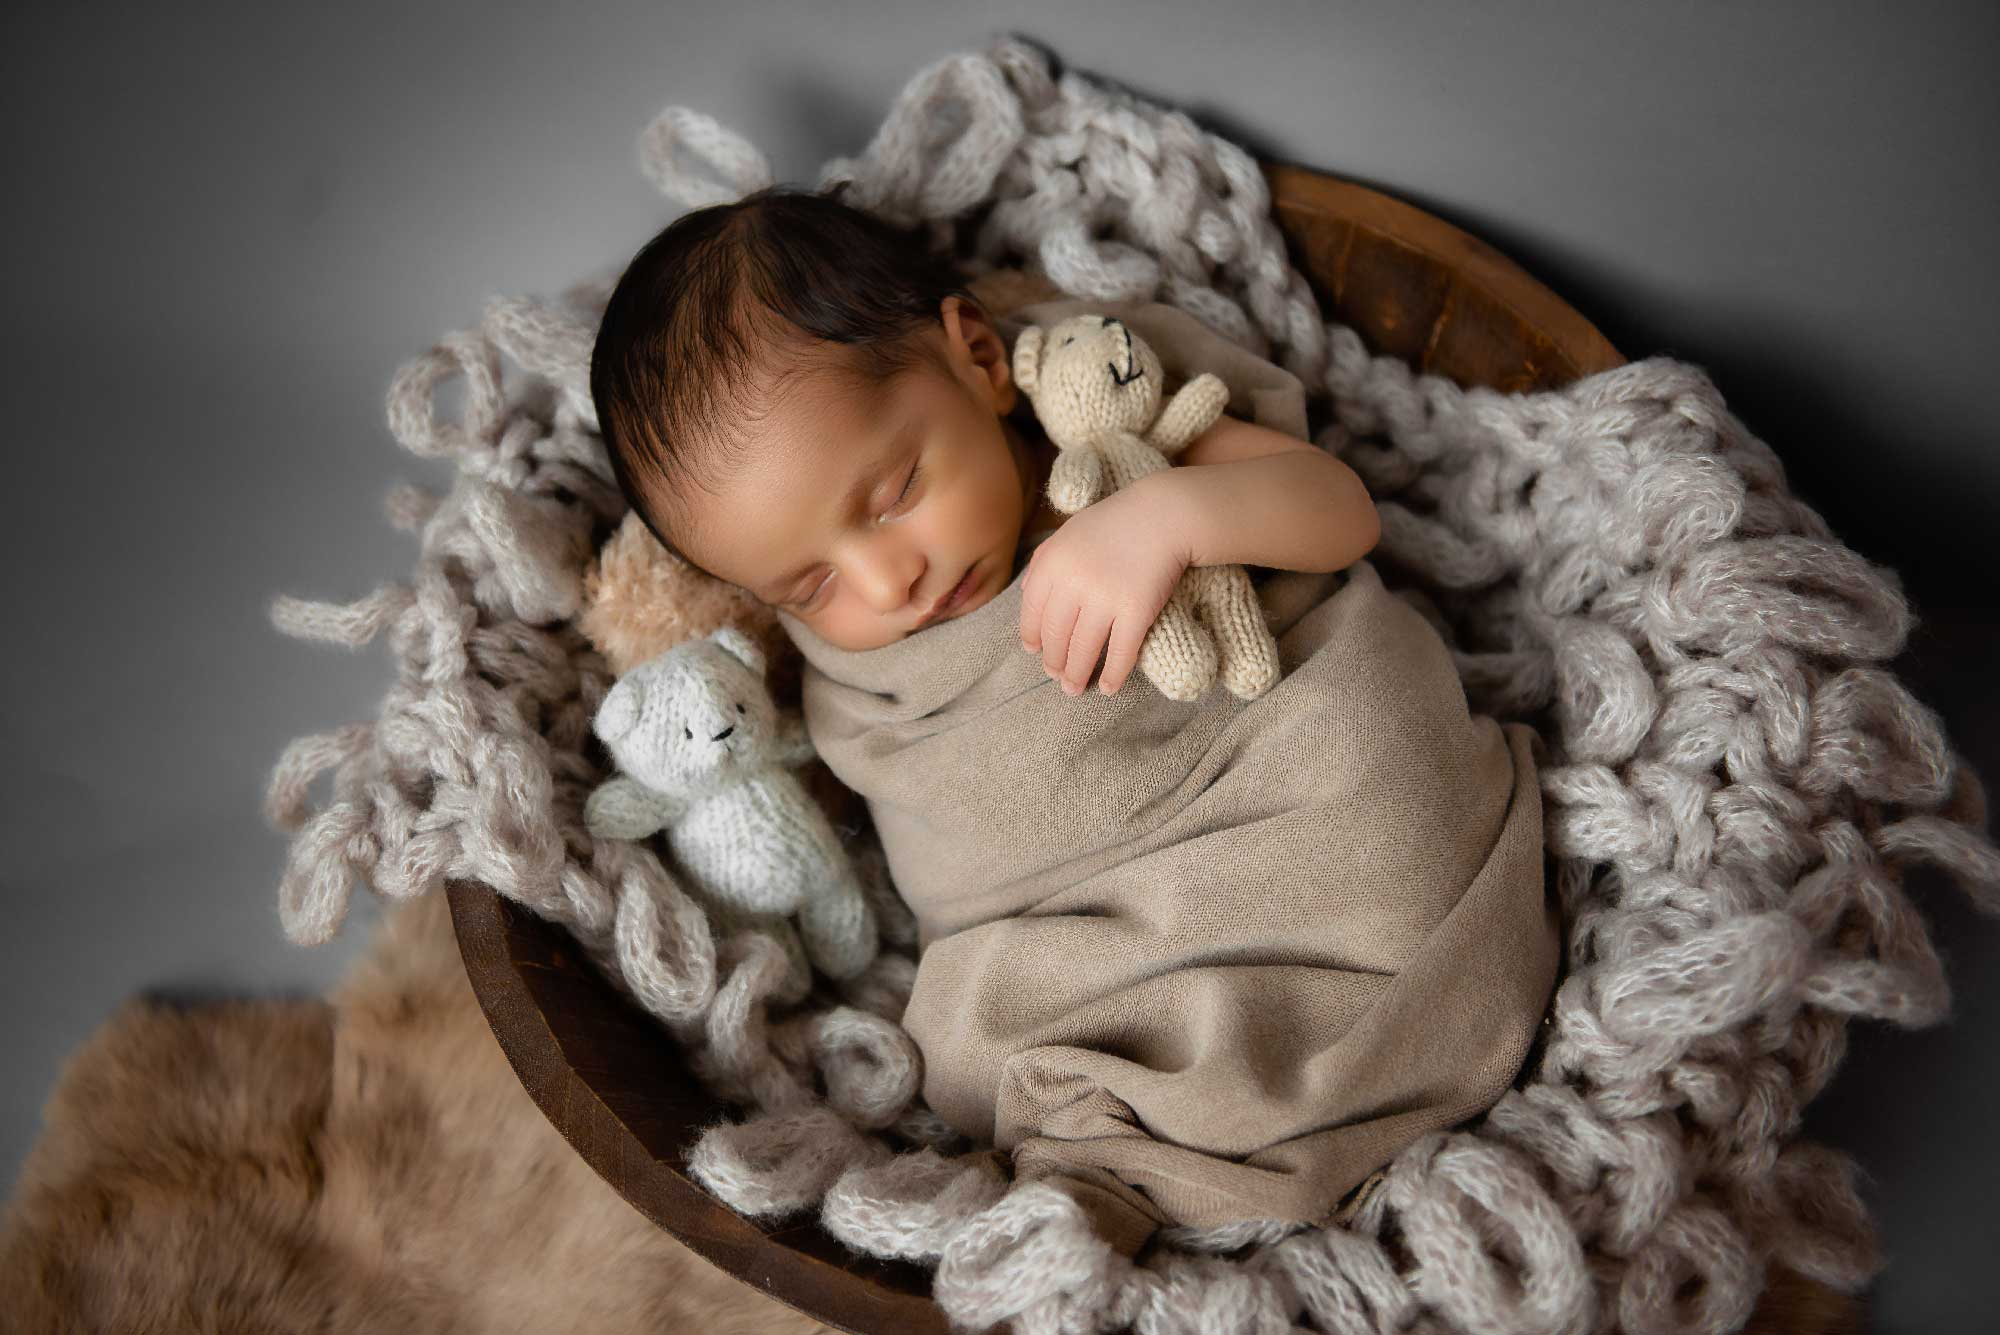 https://bworthyphotography.smugmug.com/BW-Website-Newborn-Session/Kaushal-Newborn-Session